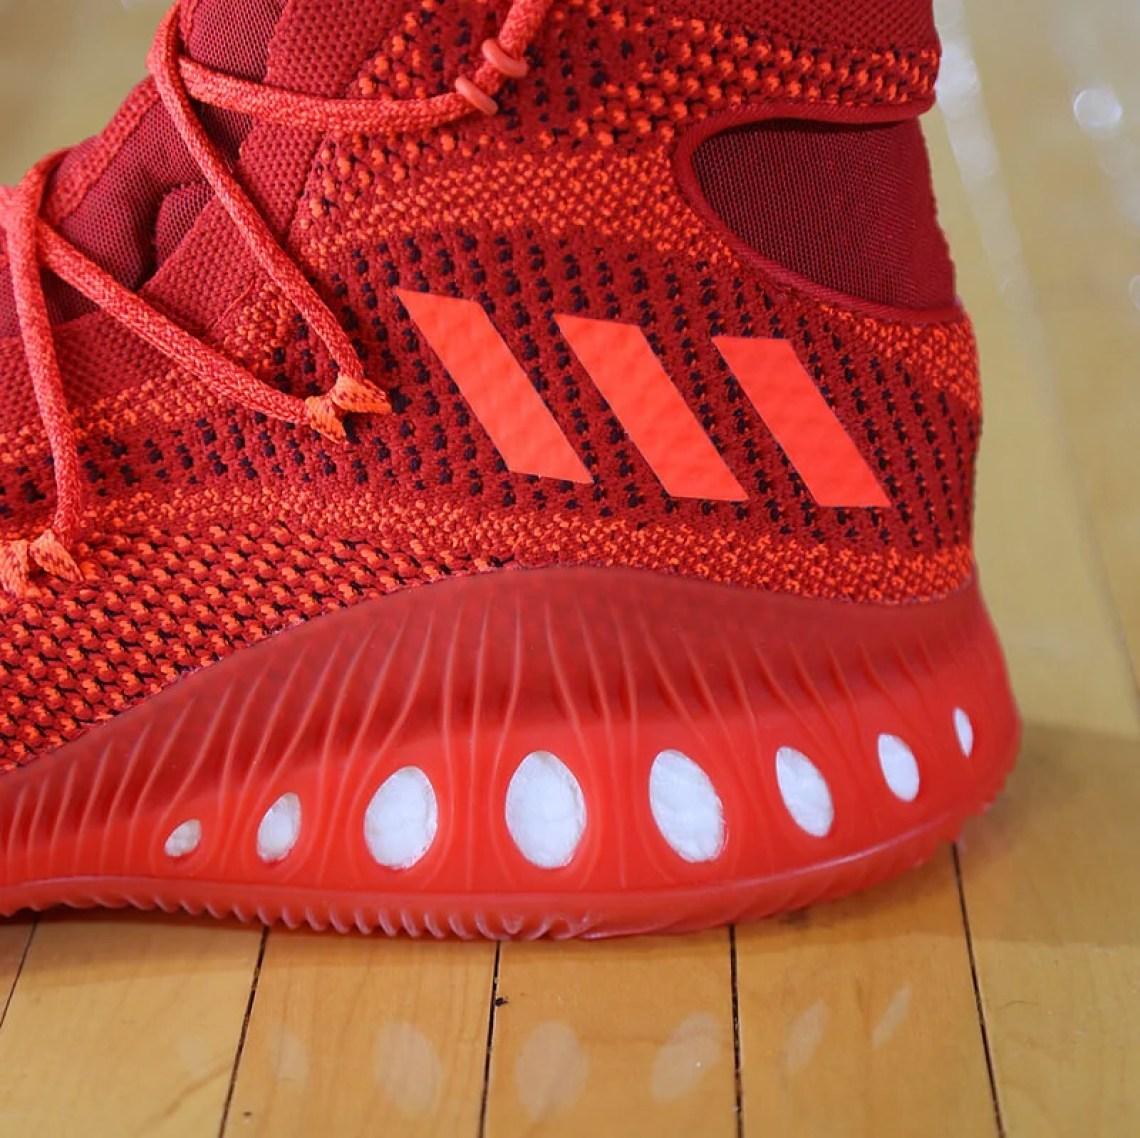 adidas Crazy Explosive Red 6